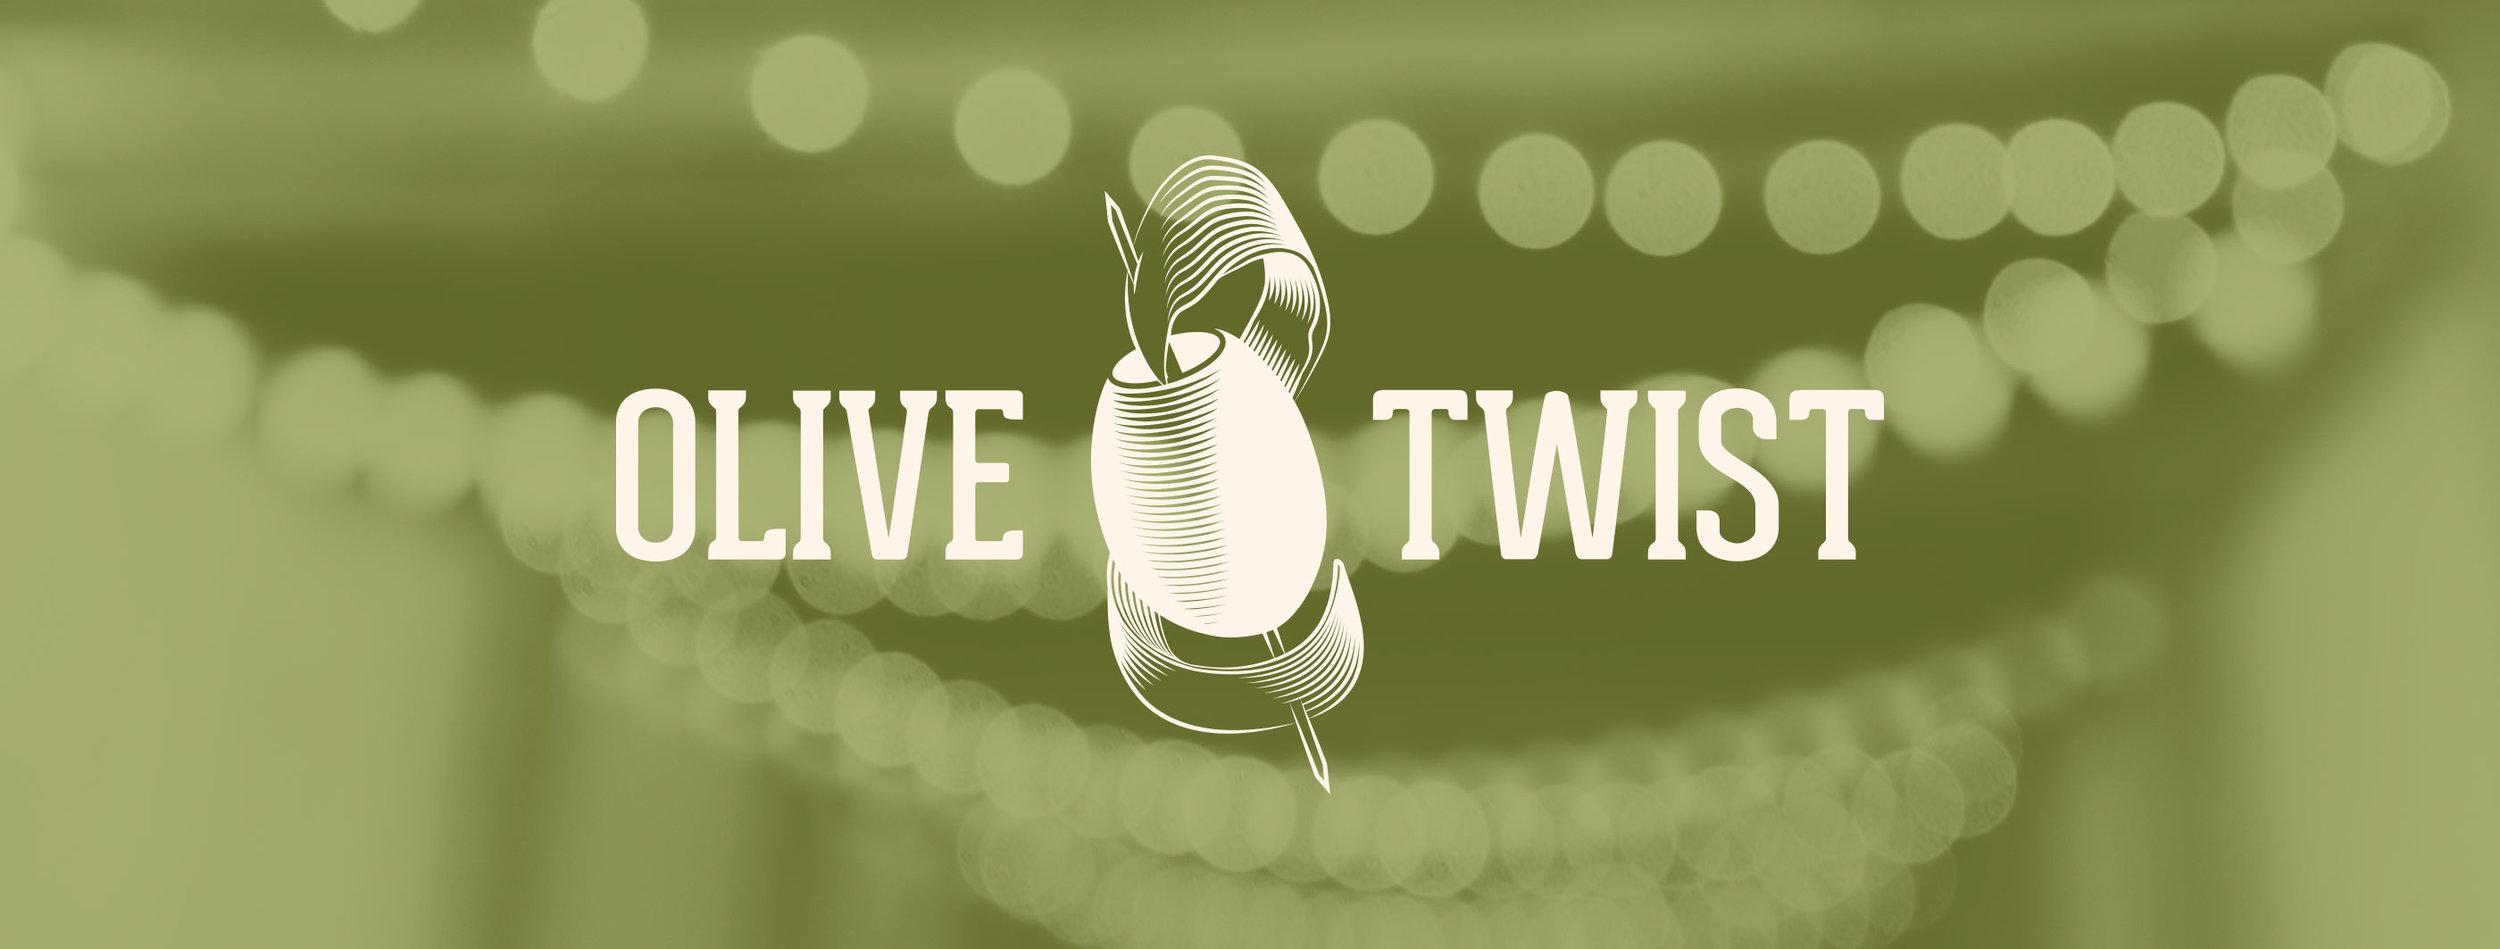 Studio-Eighty-Seven-Logo-Design-Olive-And-Twist.jpg